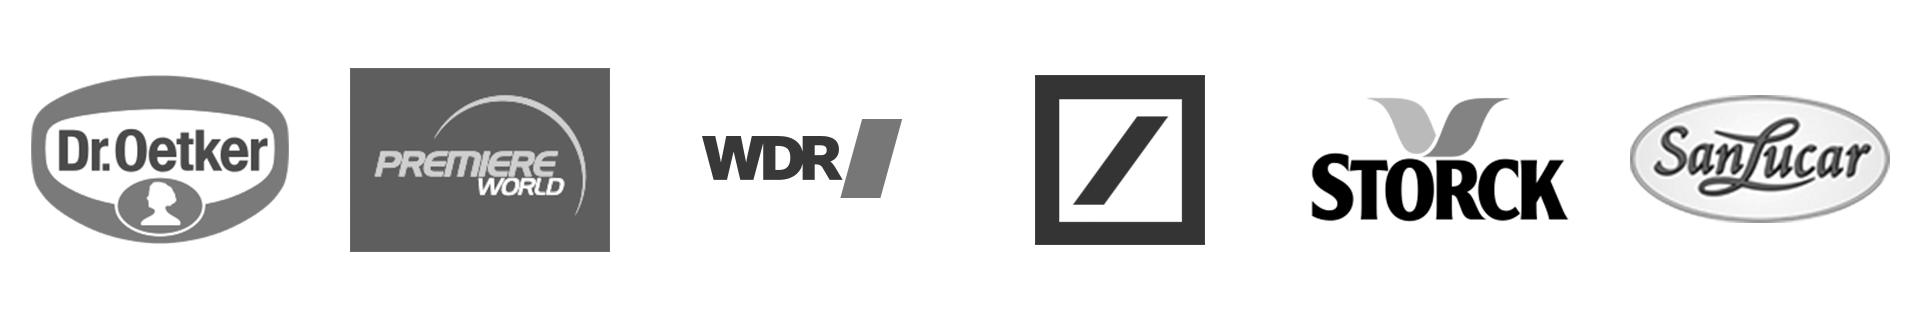 Dr. Oetker, Premiere World, WDR, Deutsche Bank, Storck, San Lucar